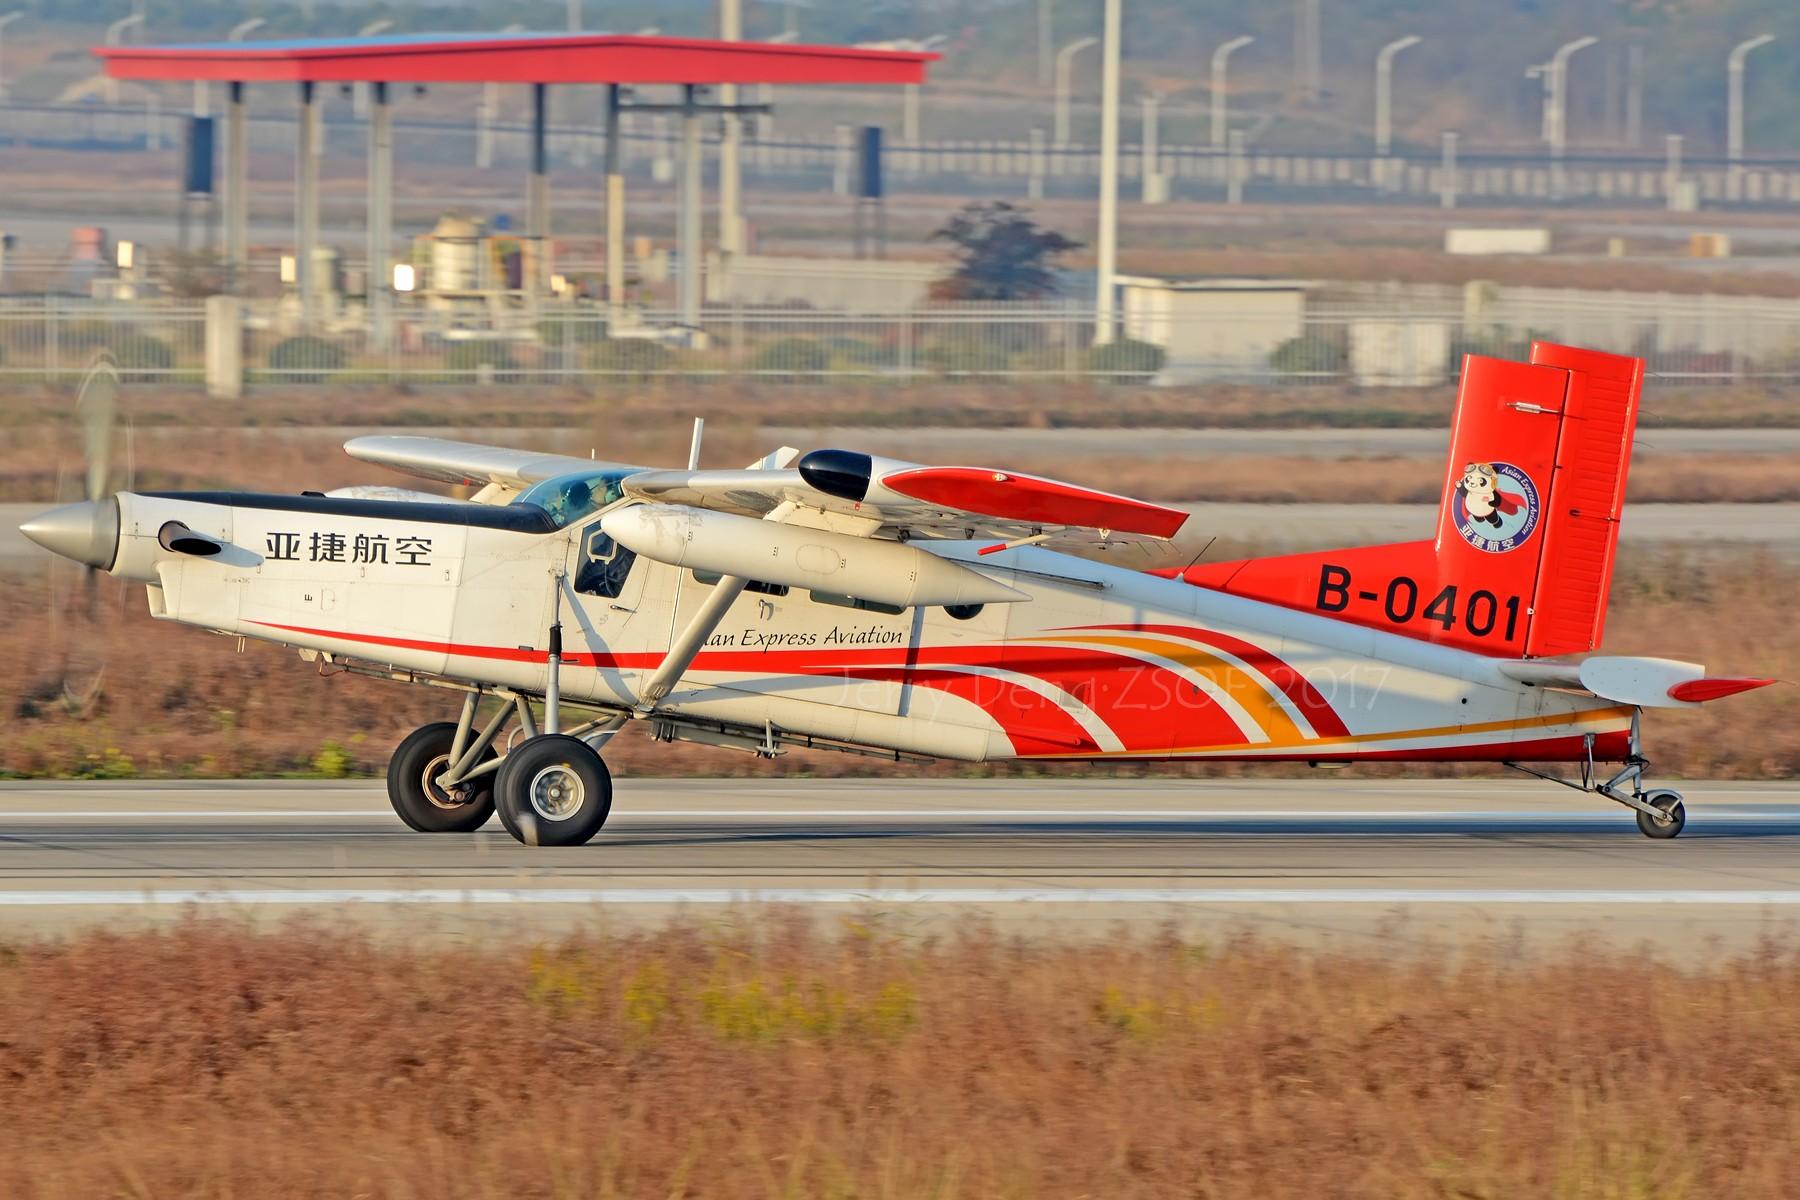 Re:[原创]【多图党】Asian Express Aviation Pilatus PC-6/B2-H4 PILATUS  PC-6/B2-H4 B-0401 中国合肥新桥国际机场